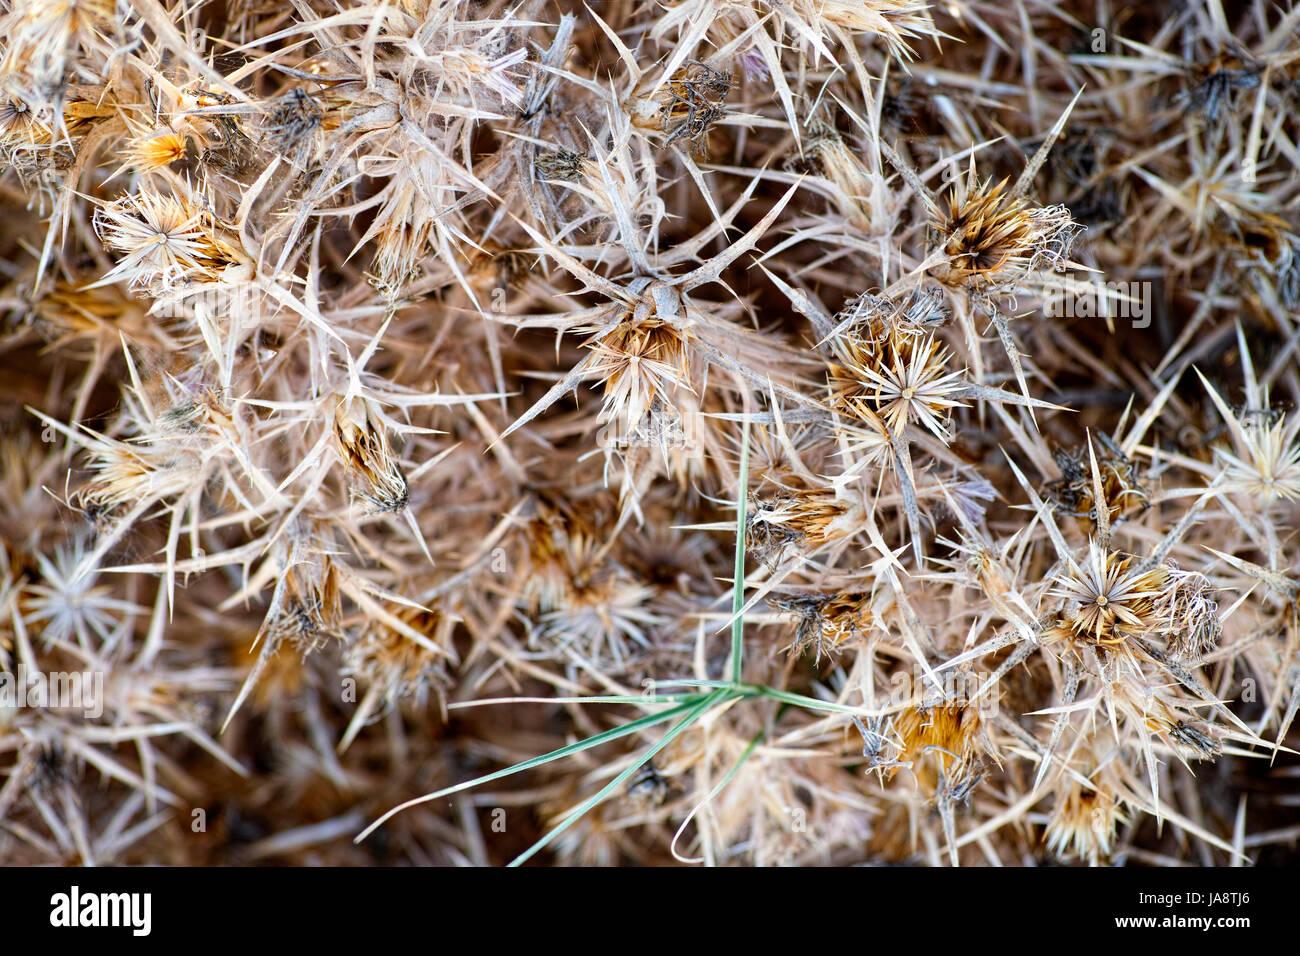 Dry prickly bush. Full frame. - Stock Image